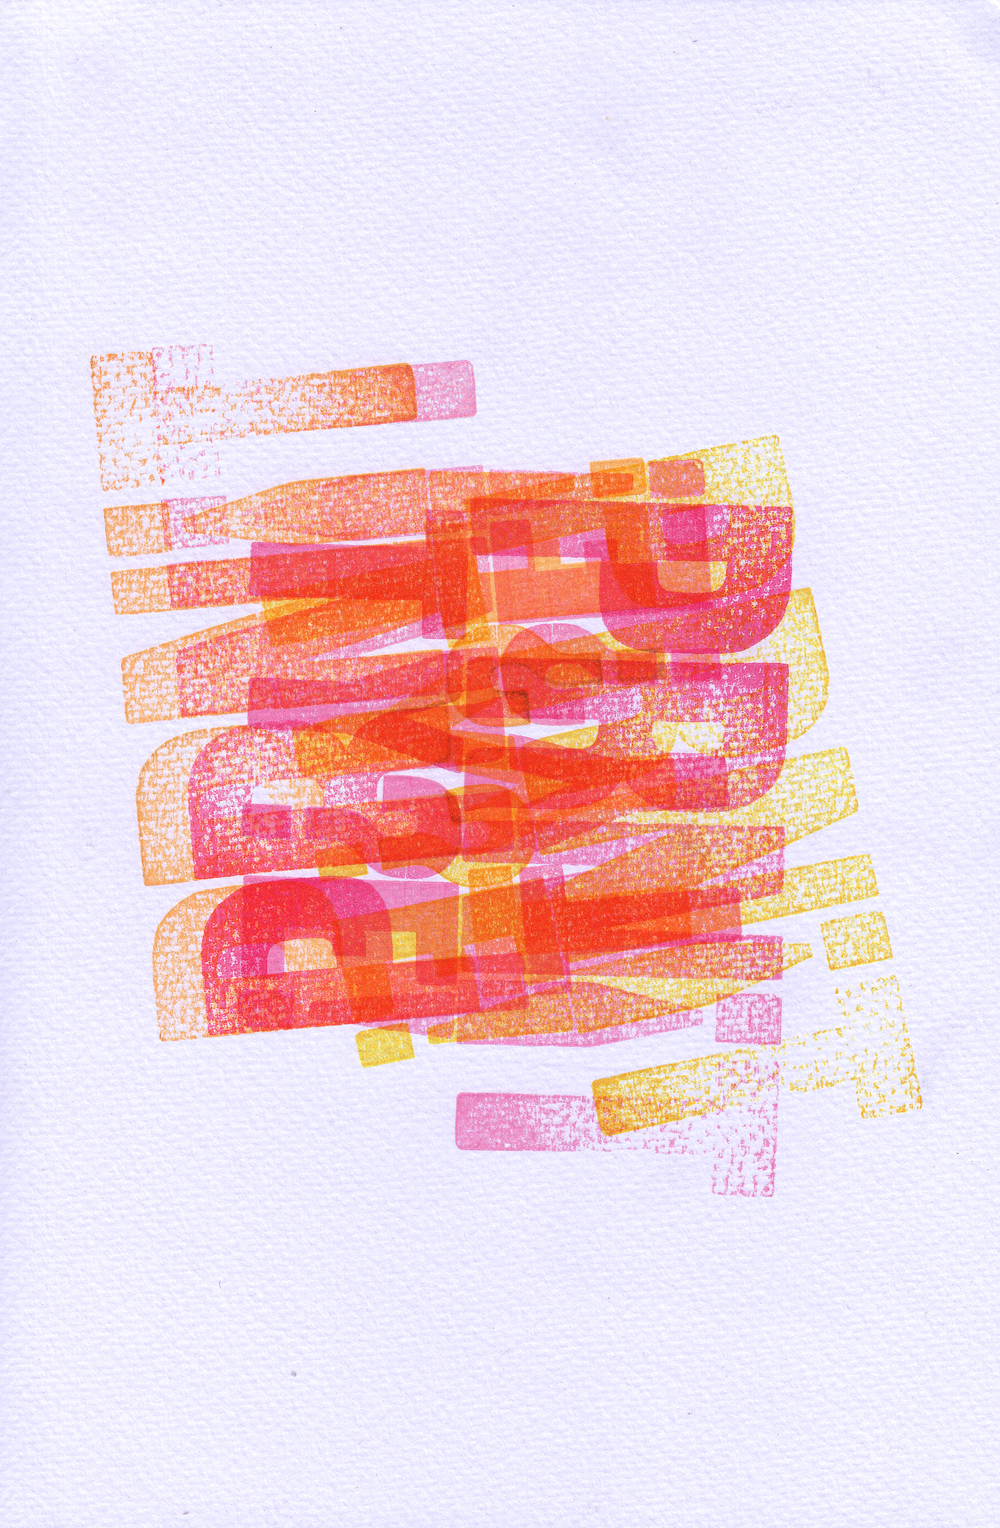 print_0002.jpg